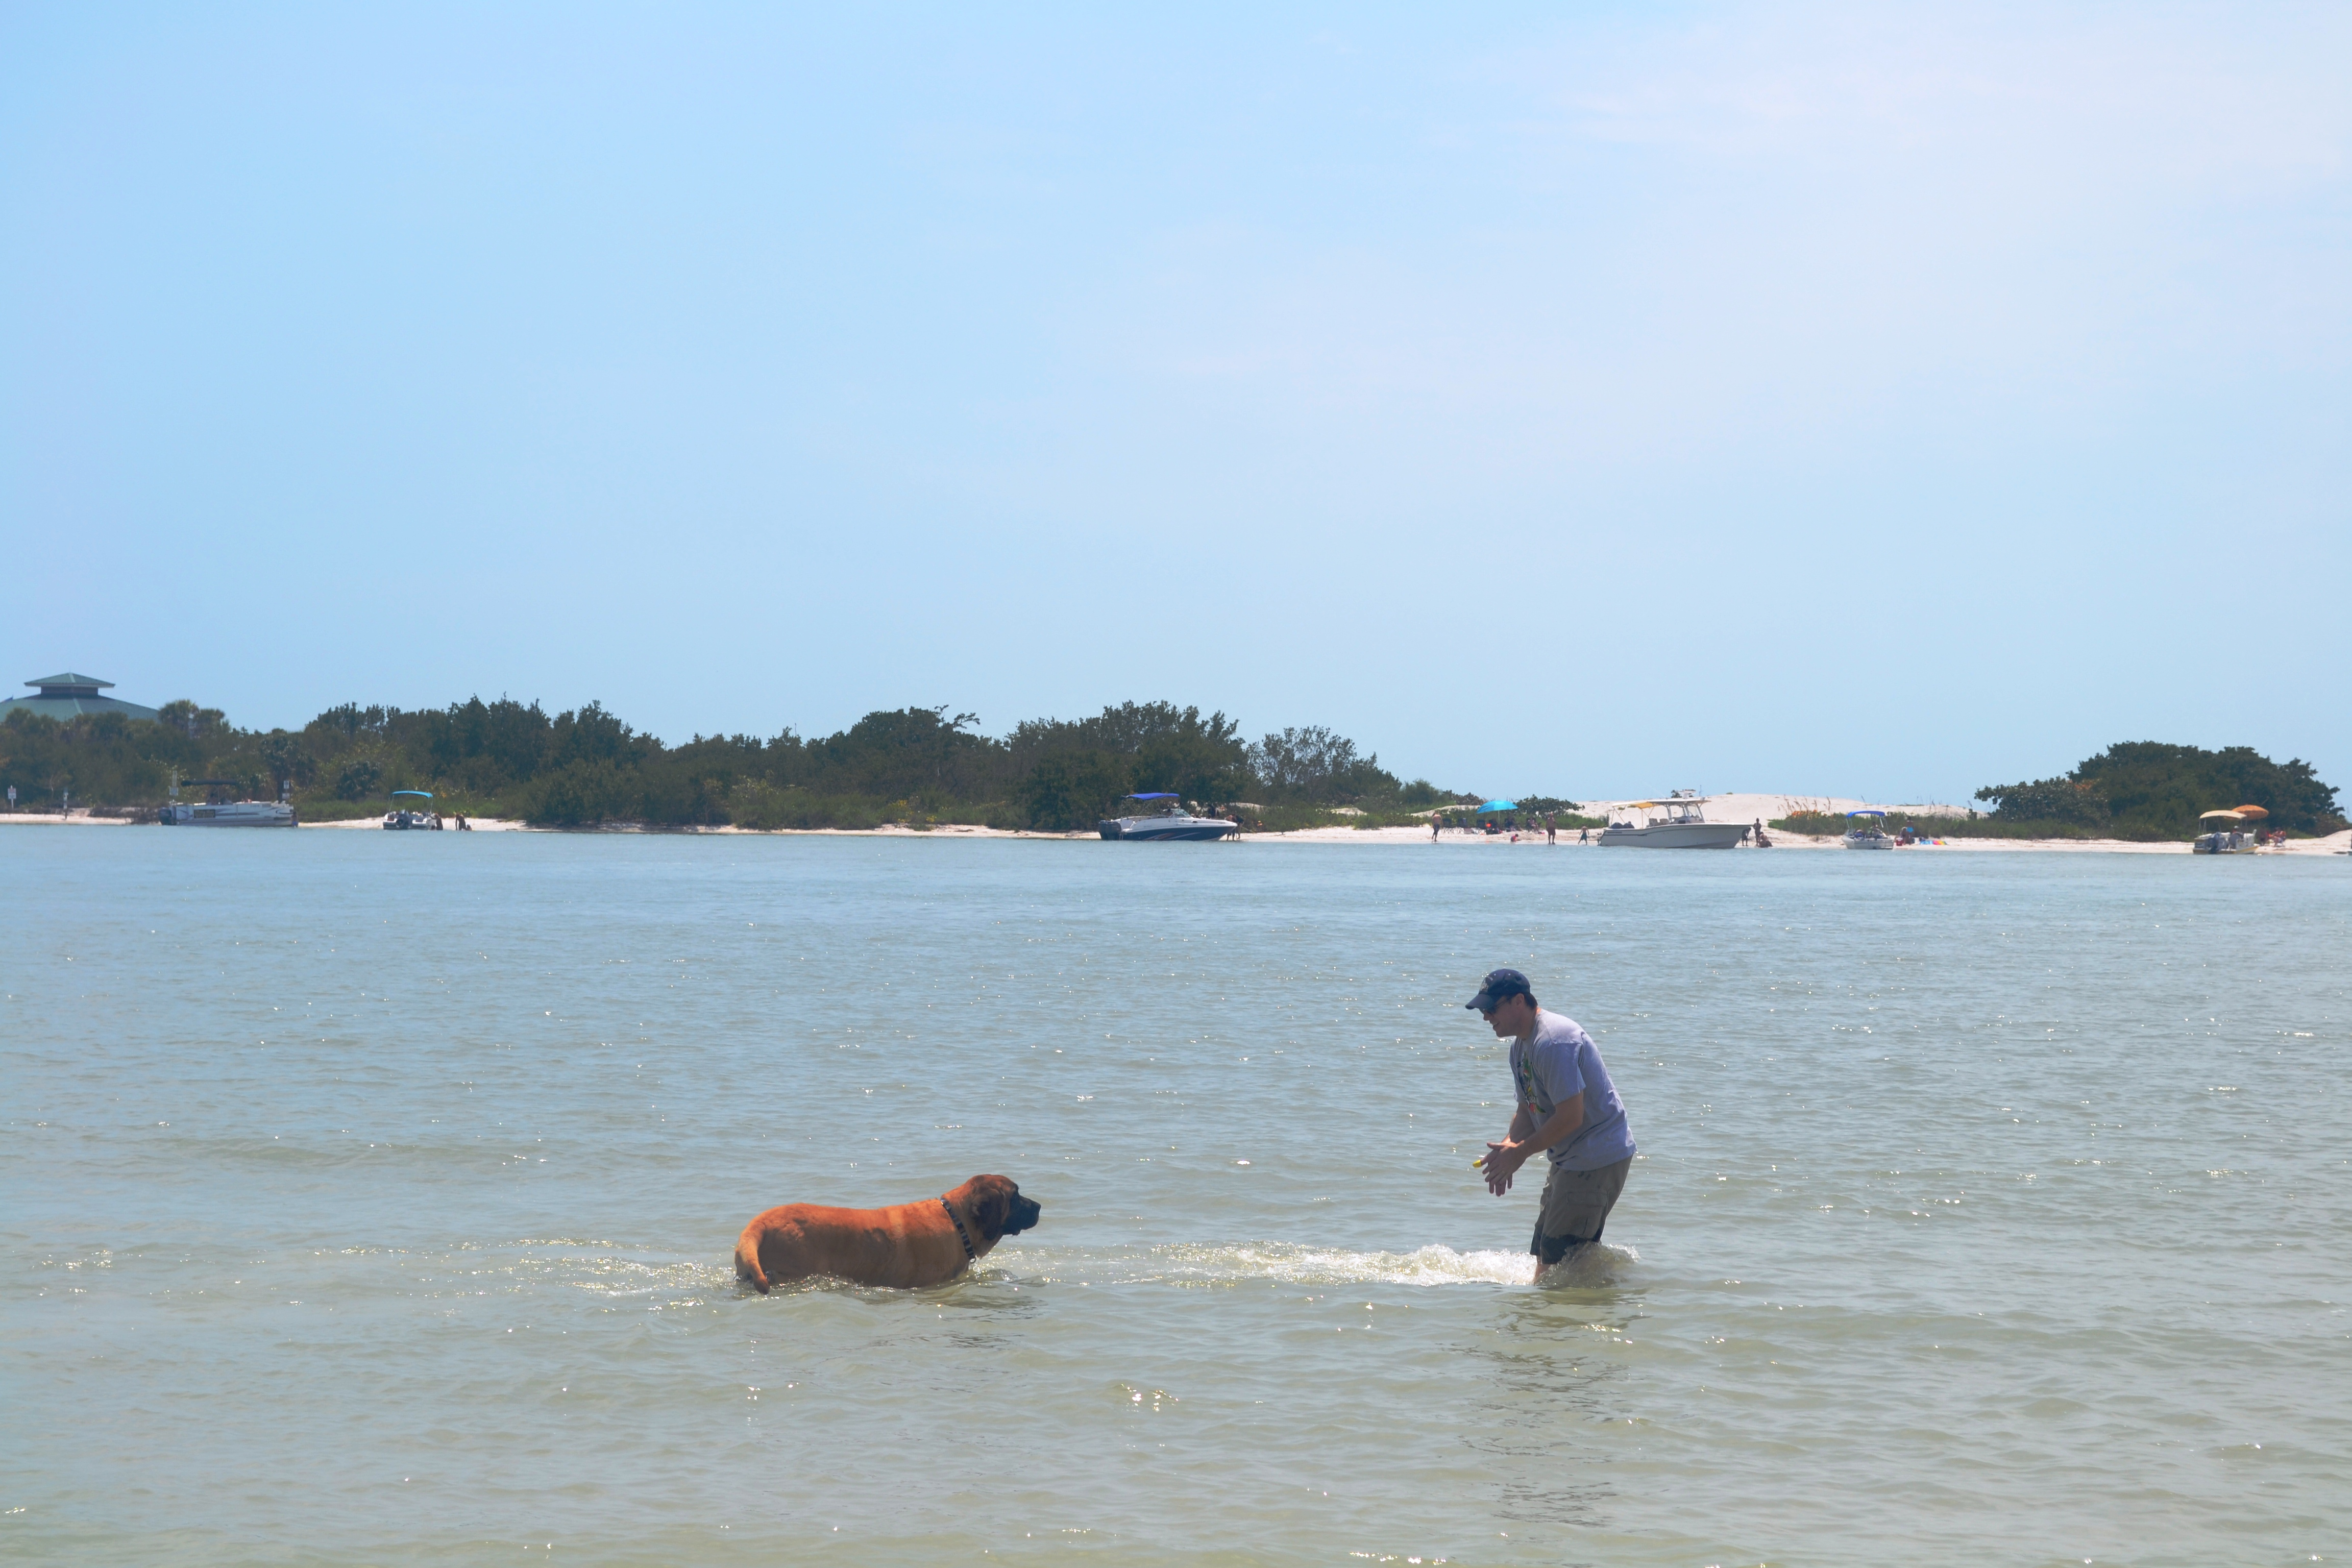 Buddy swim